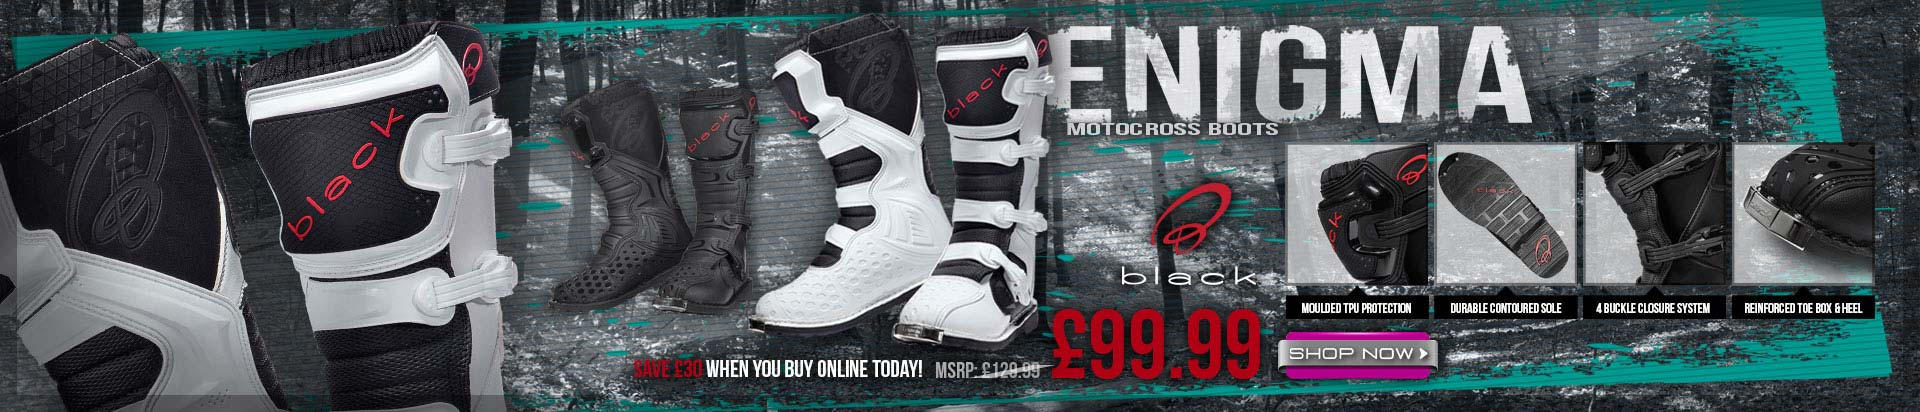 Black Enigma Mx Boots